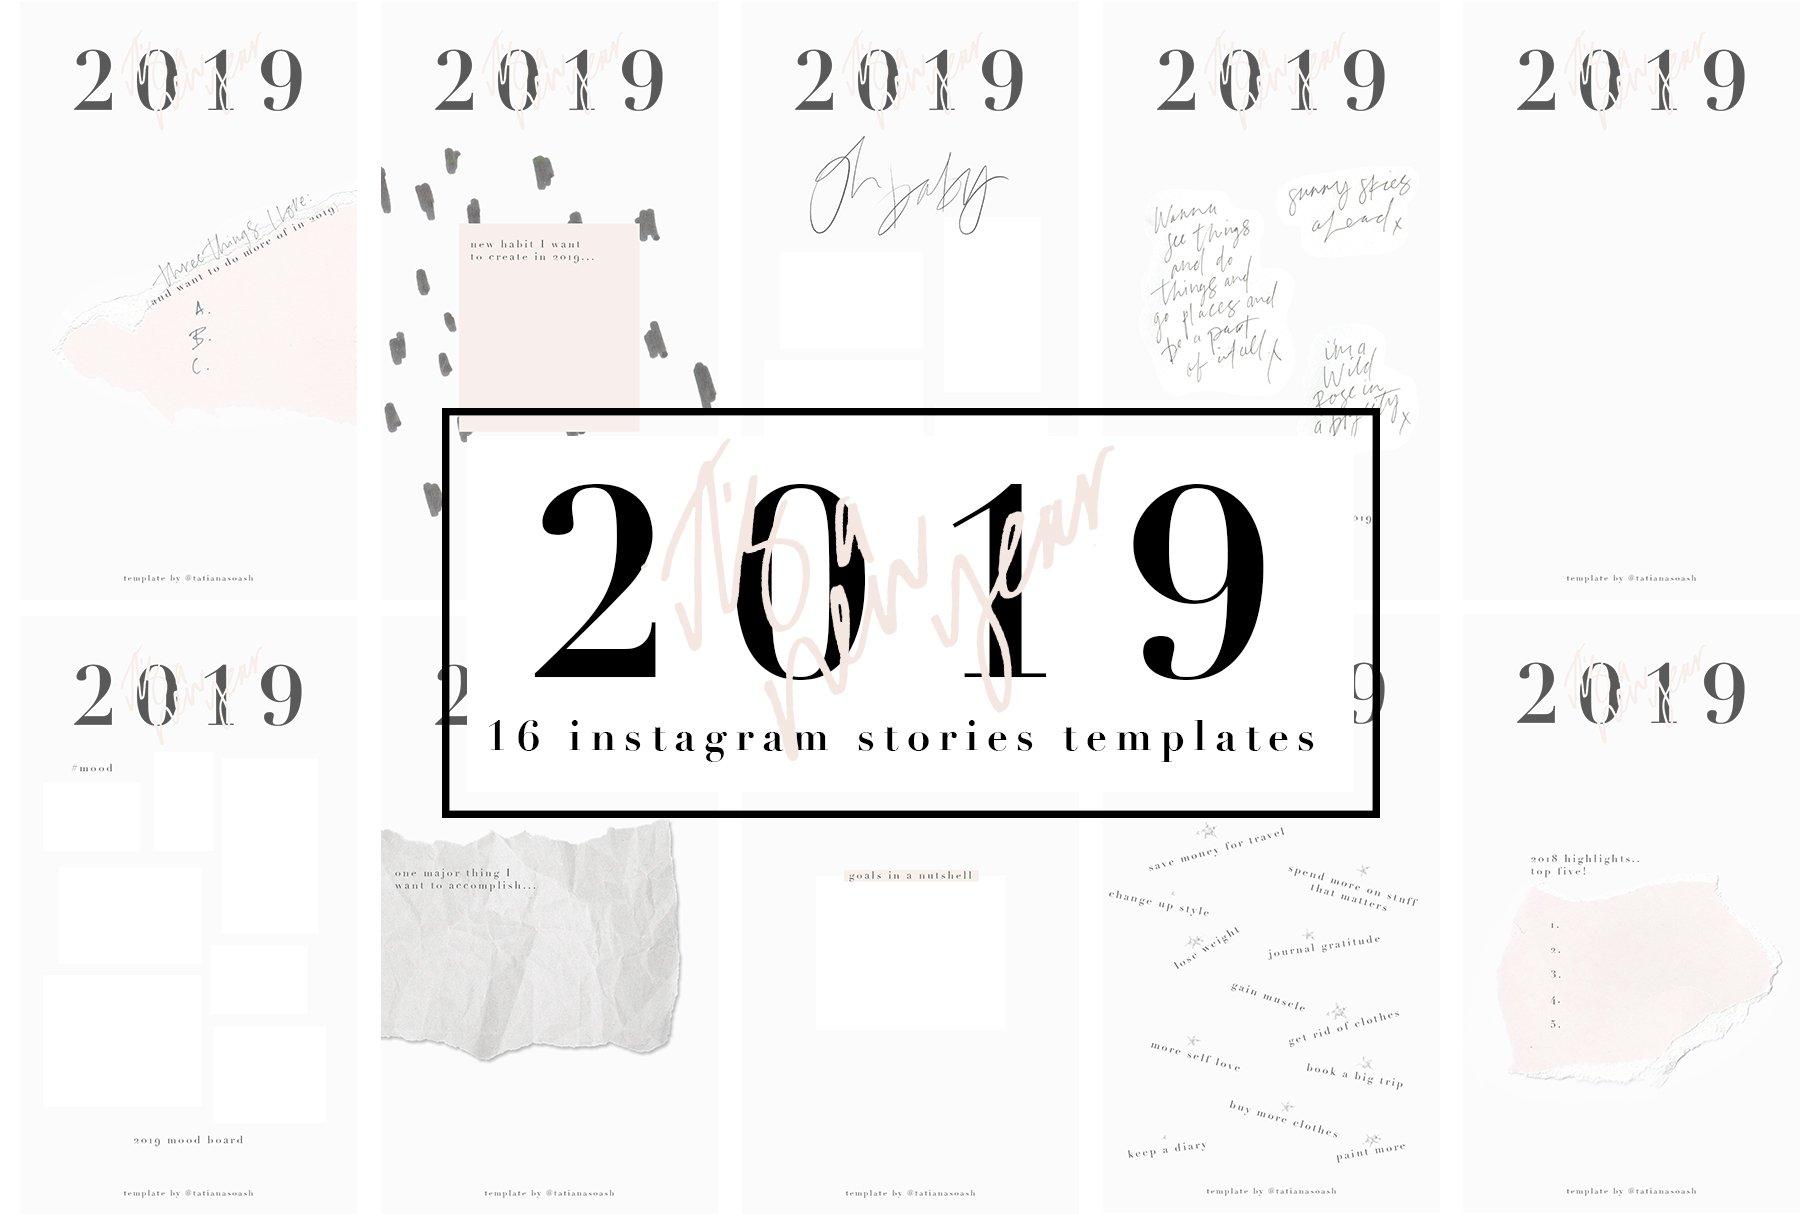 2019 Instagram Stories Templates ~ Instagram Templates